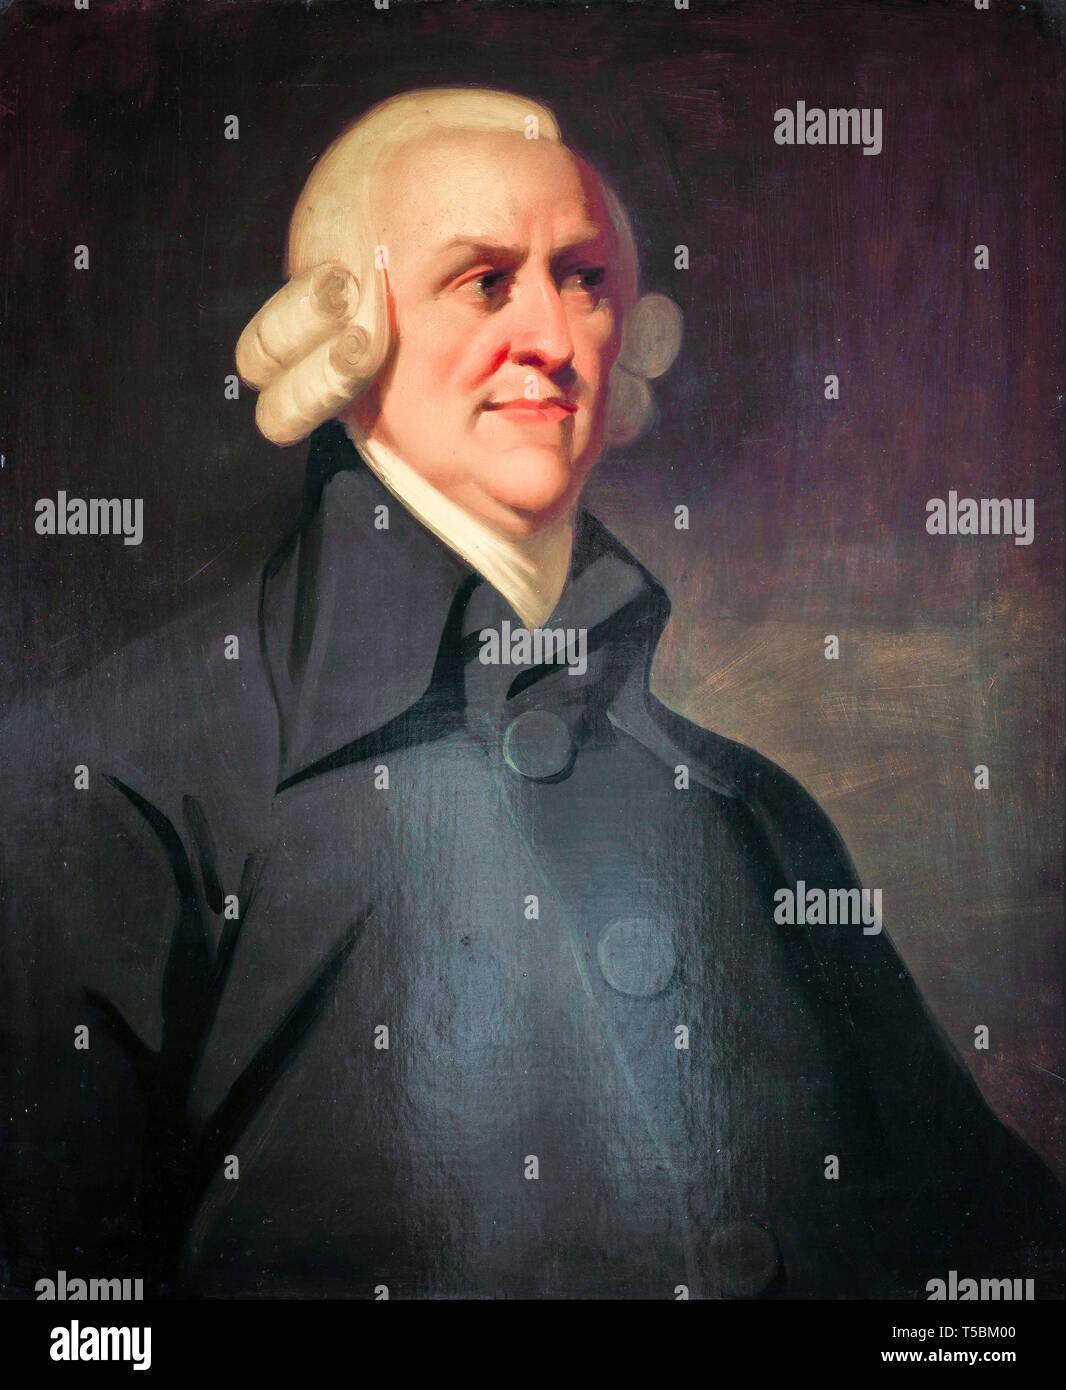 Adam Smith (1723-1790), portrait painting, The Muir portrait, c. 1800 Stock Photo